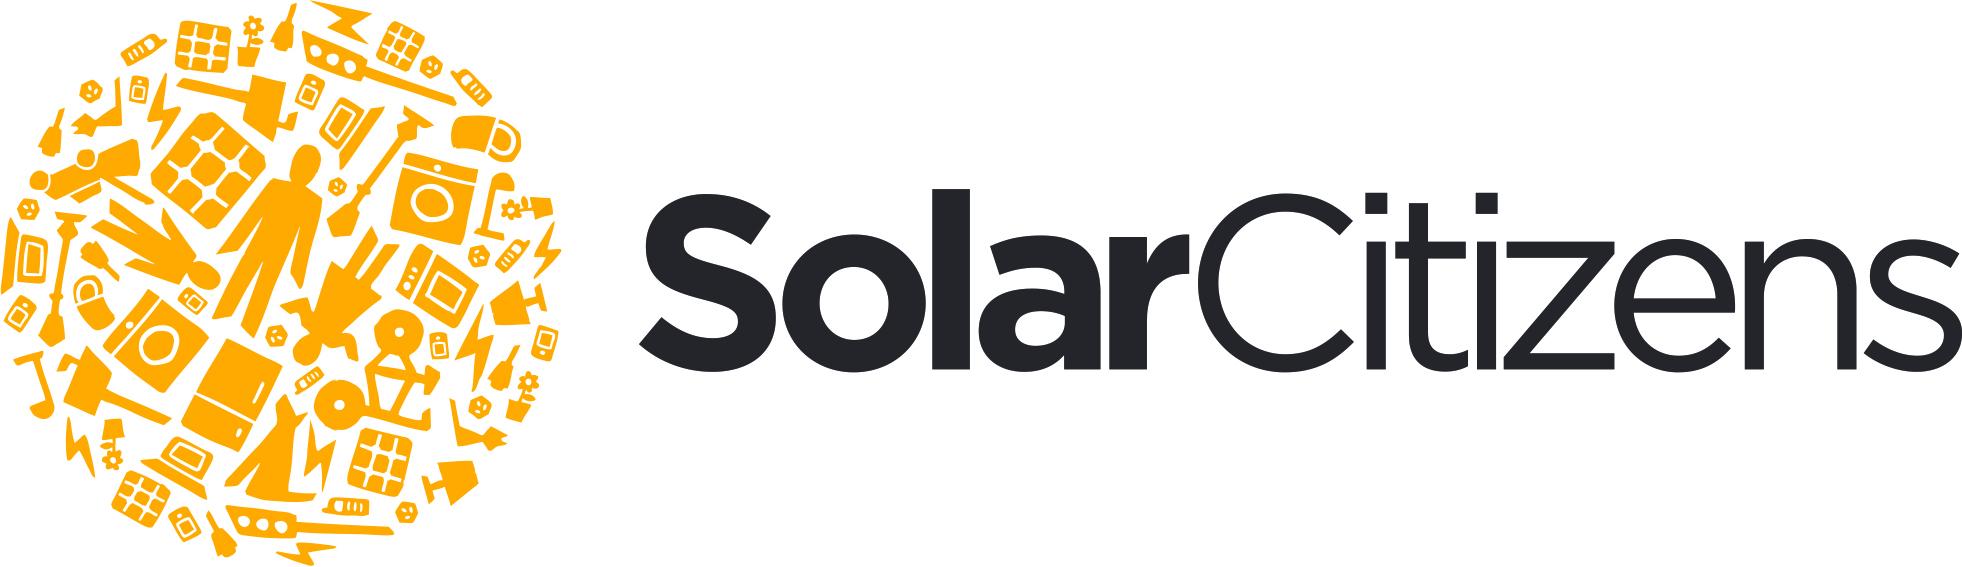 Donate to Solar Citizens